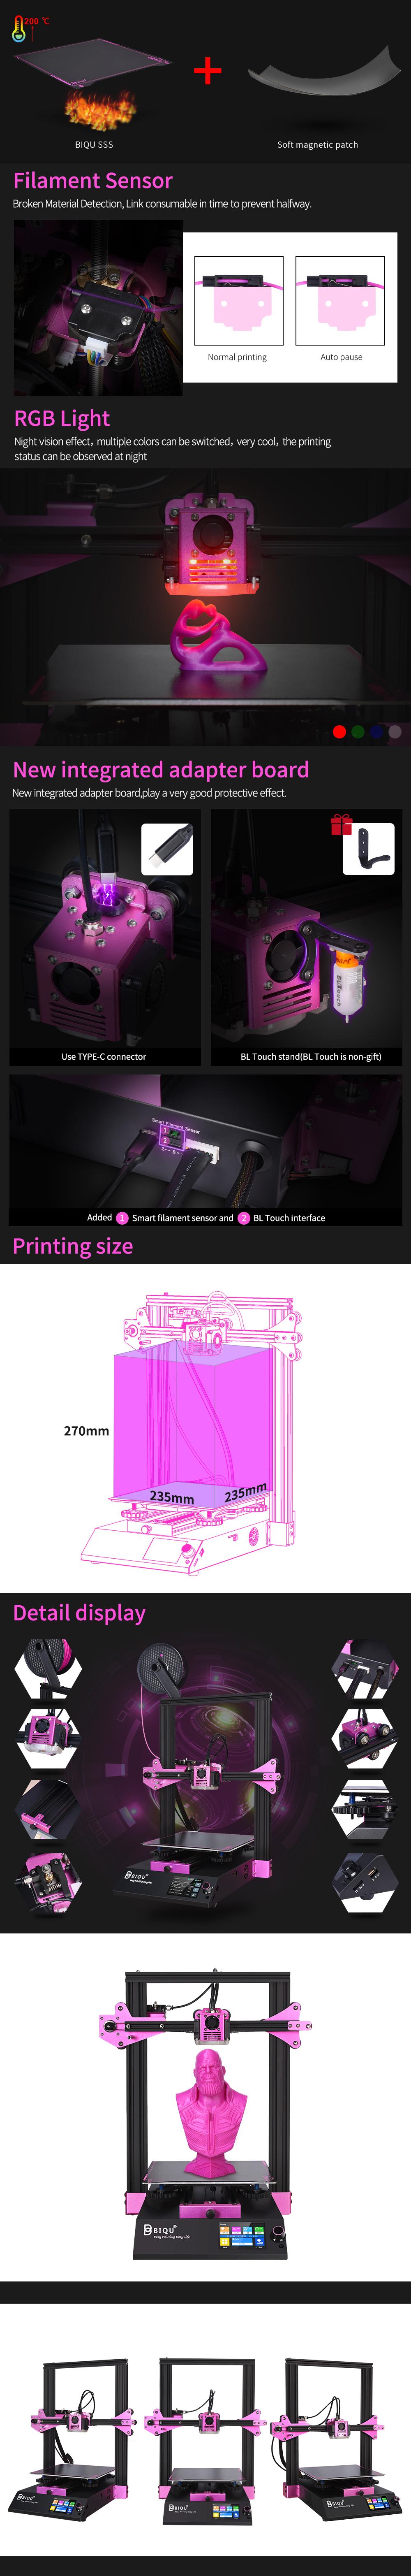 BIQU 3D Printere hos SoluNOiD.dk